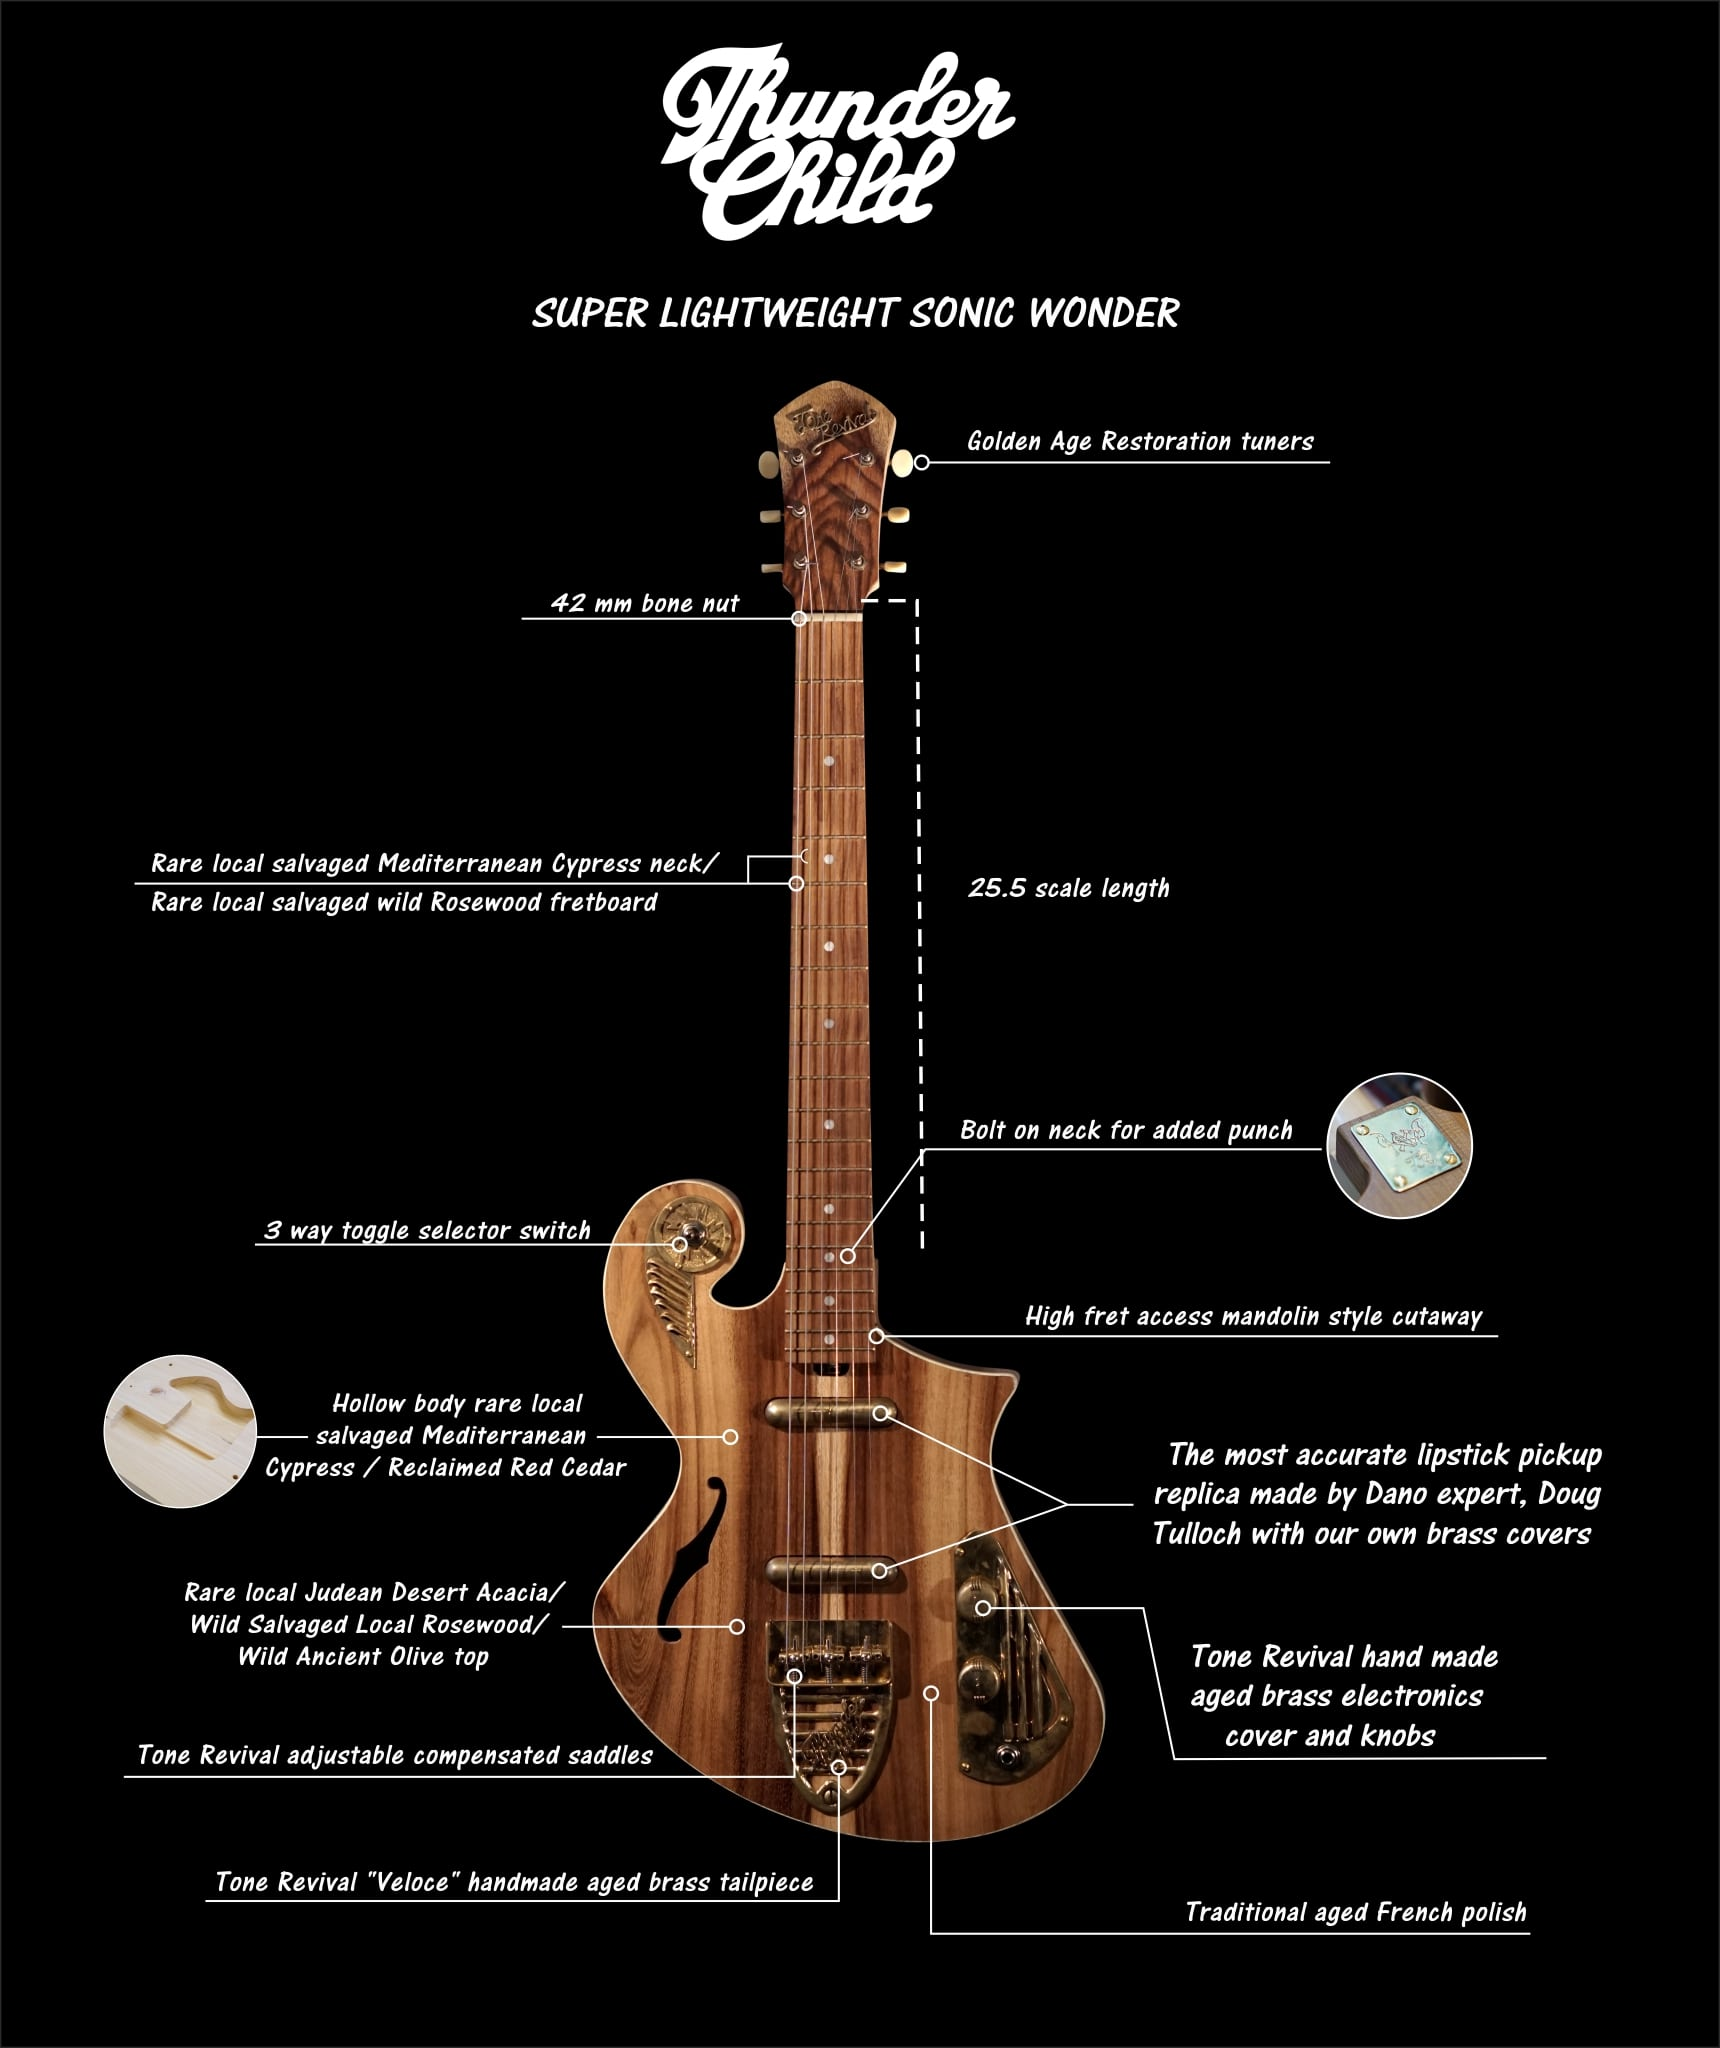 habdcrafted guitar - ThunderChild